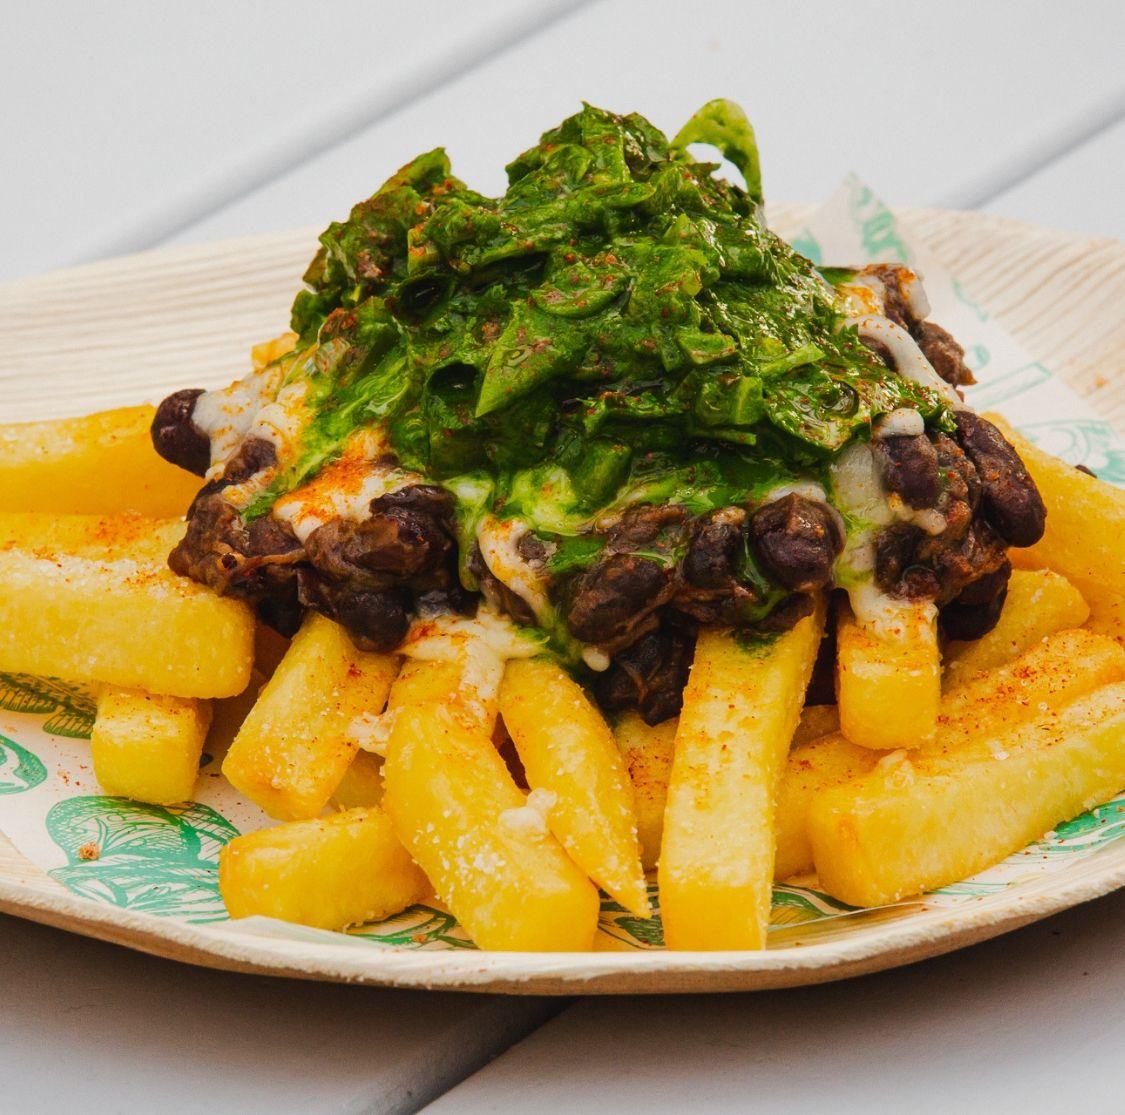 Mar and Tierra Loaded Fries - Beef brisket, mozzarella, green Criolla